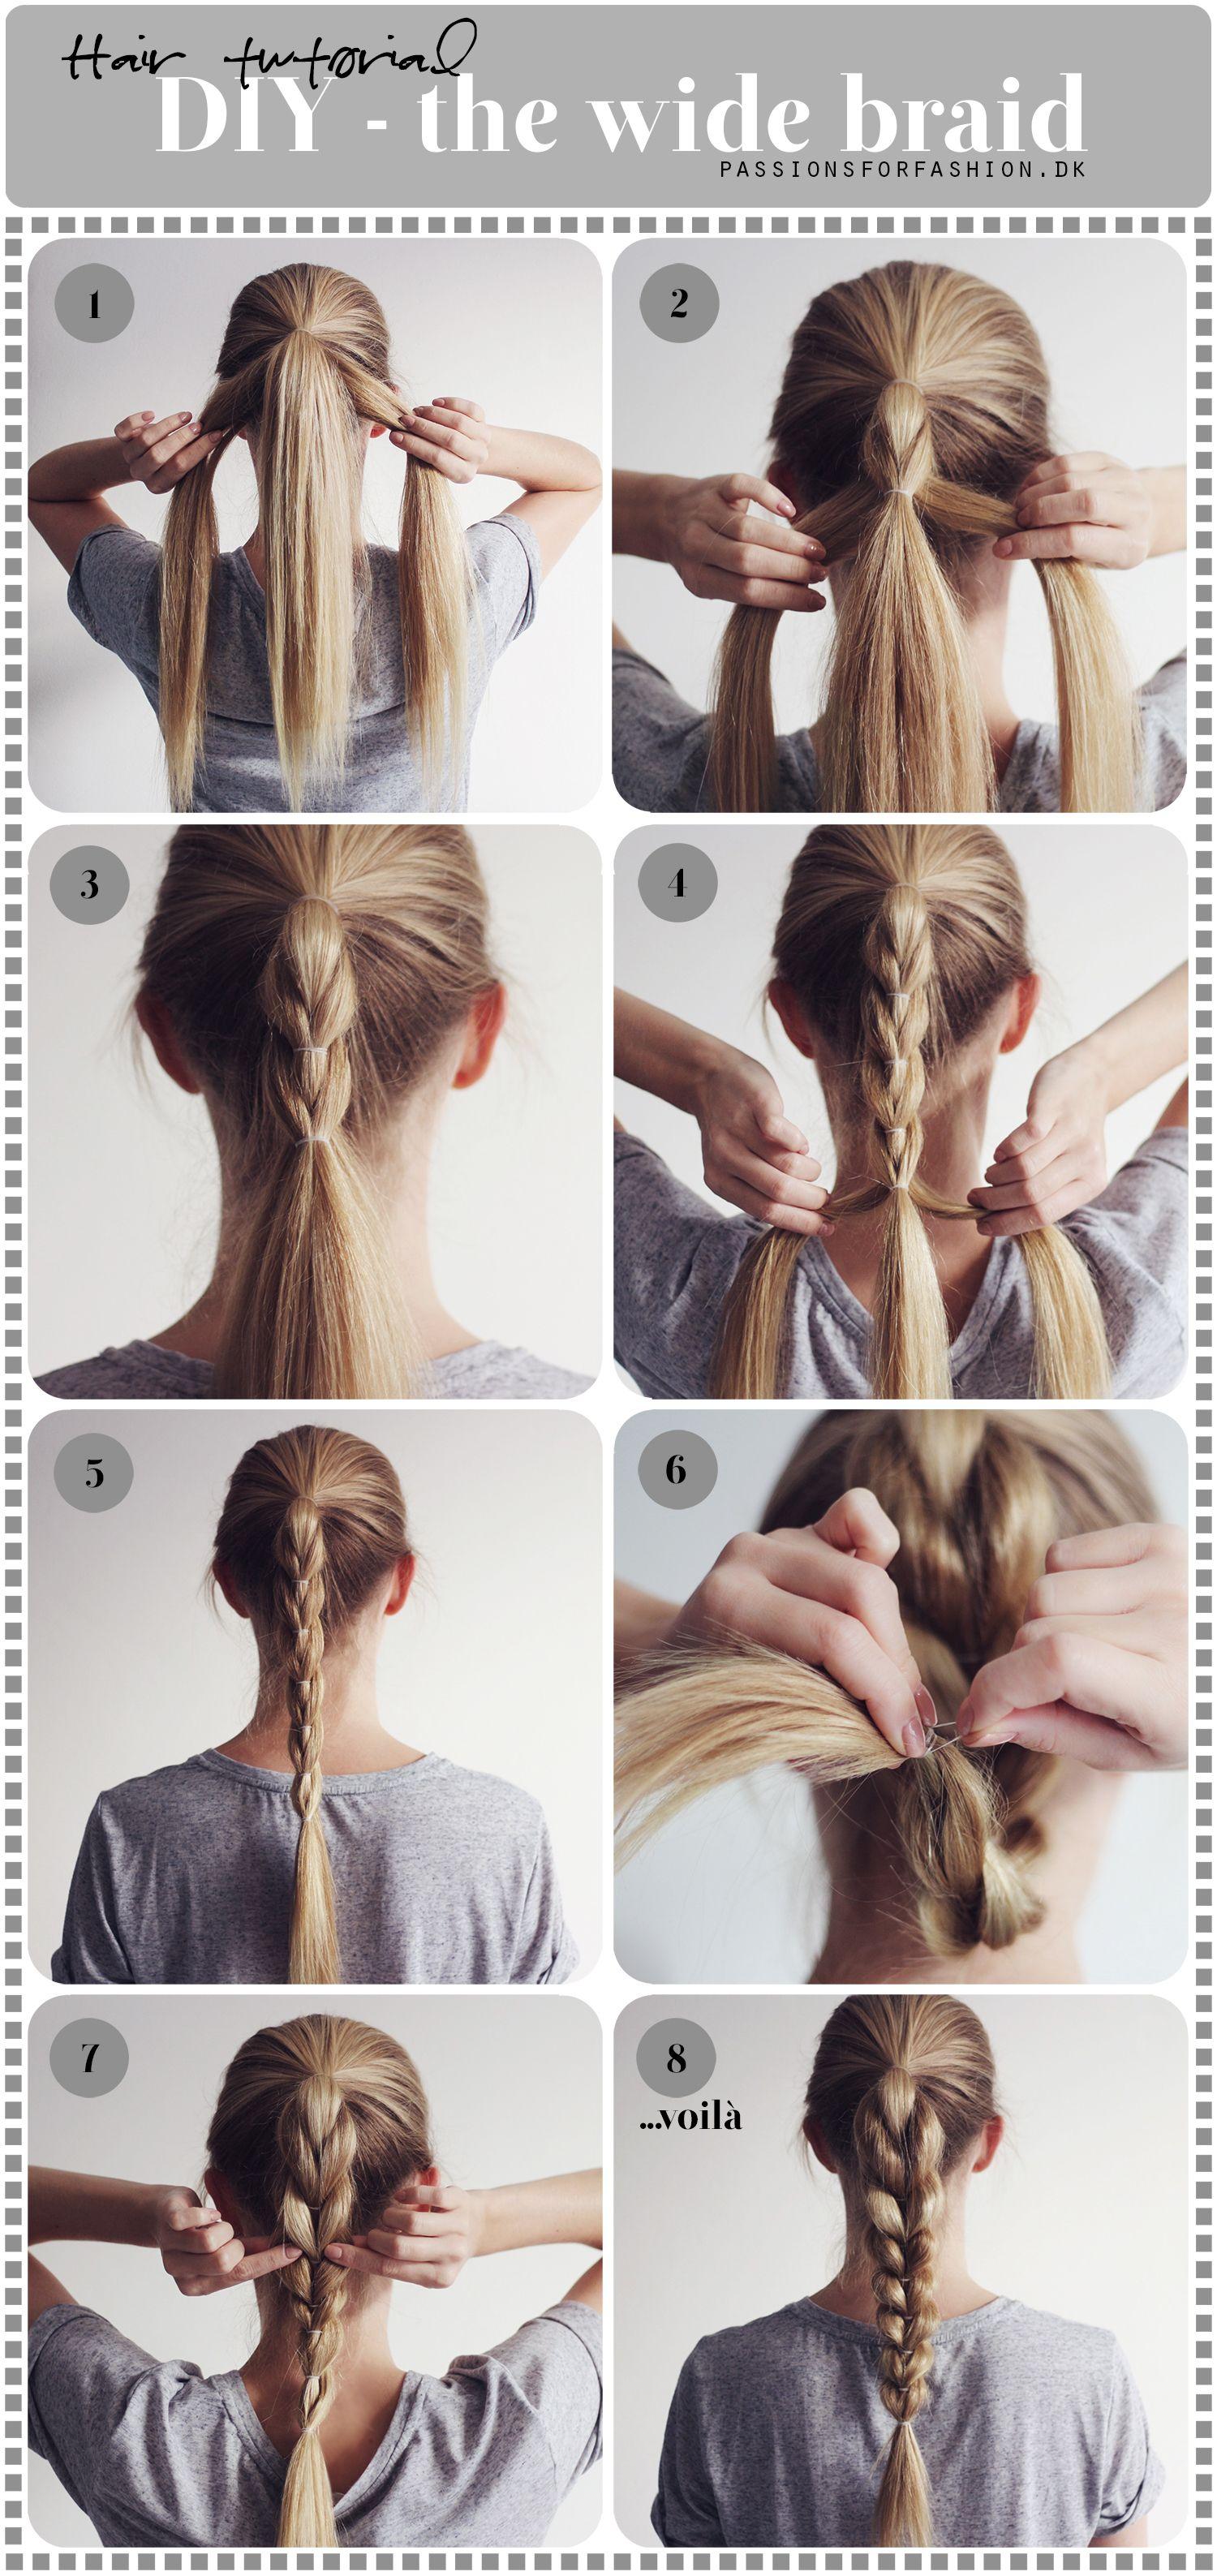 Diy the wide braid christina dueholm stylinu pinterest hair